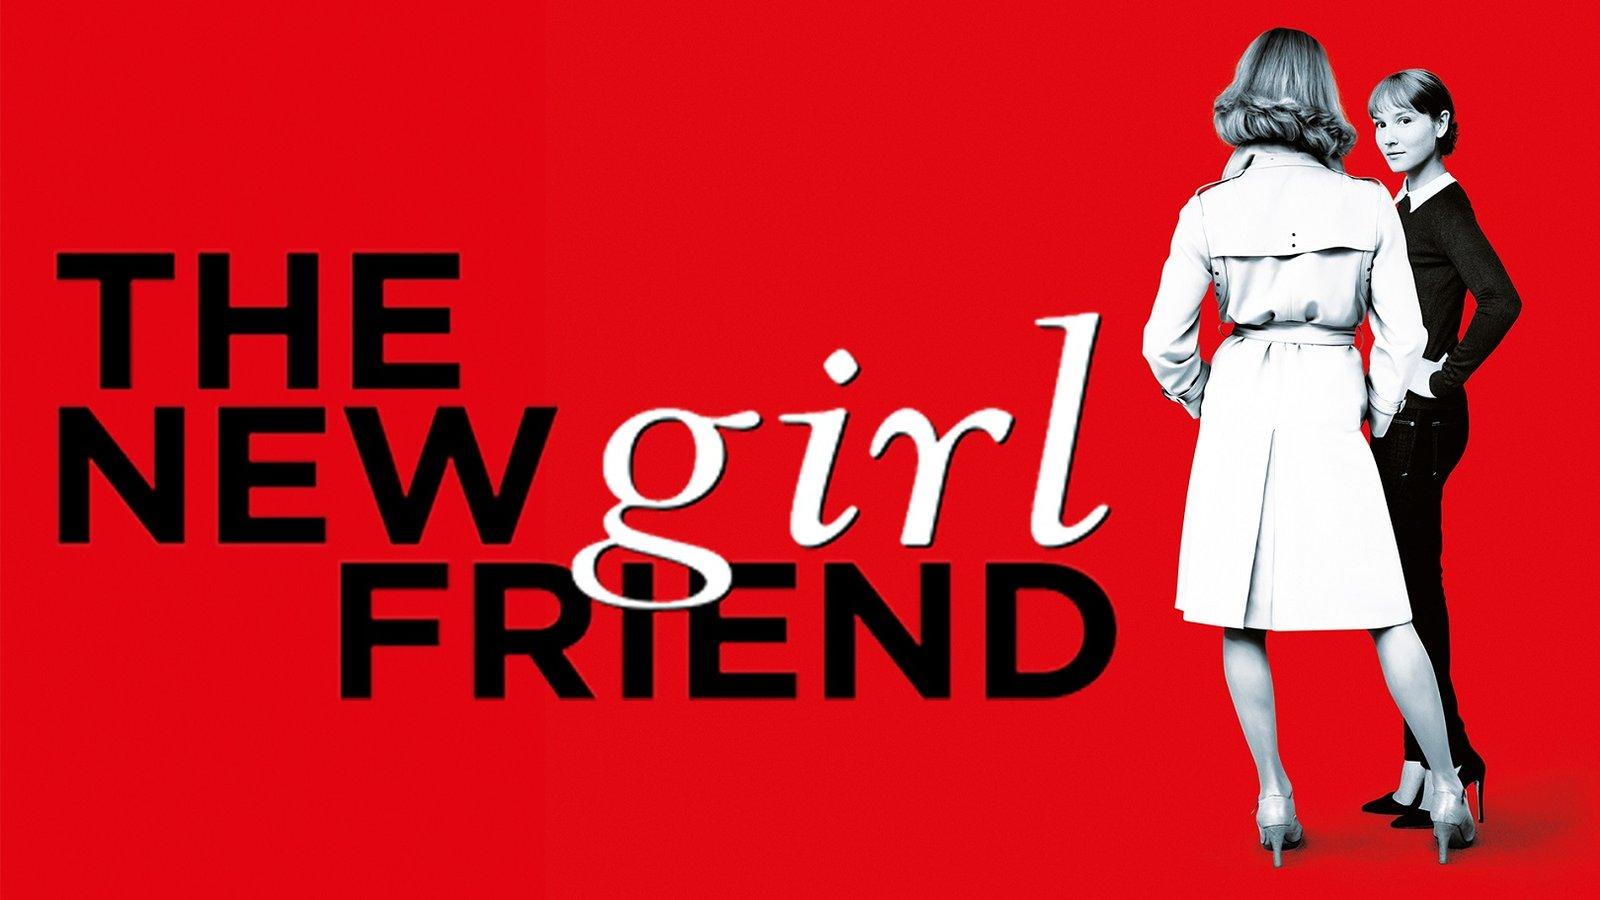 The New Girlfriend - Une nouvelle amie